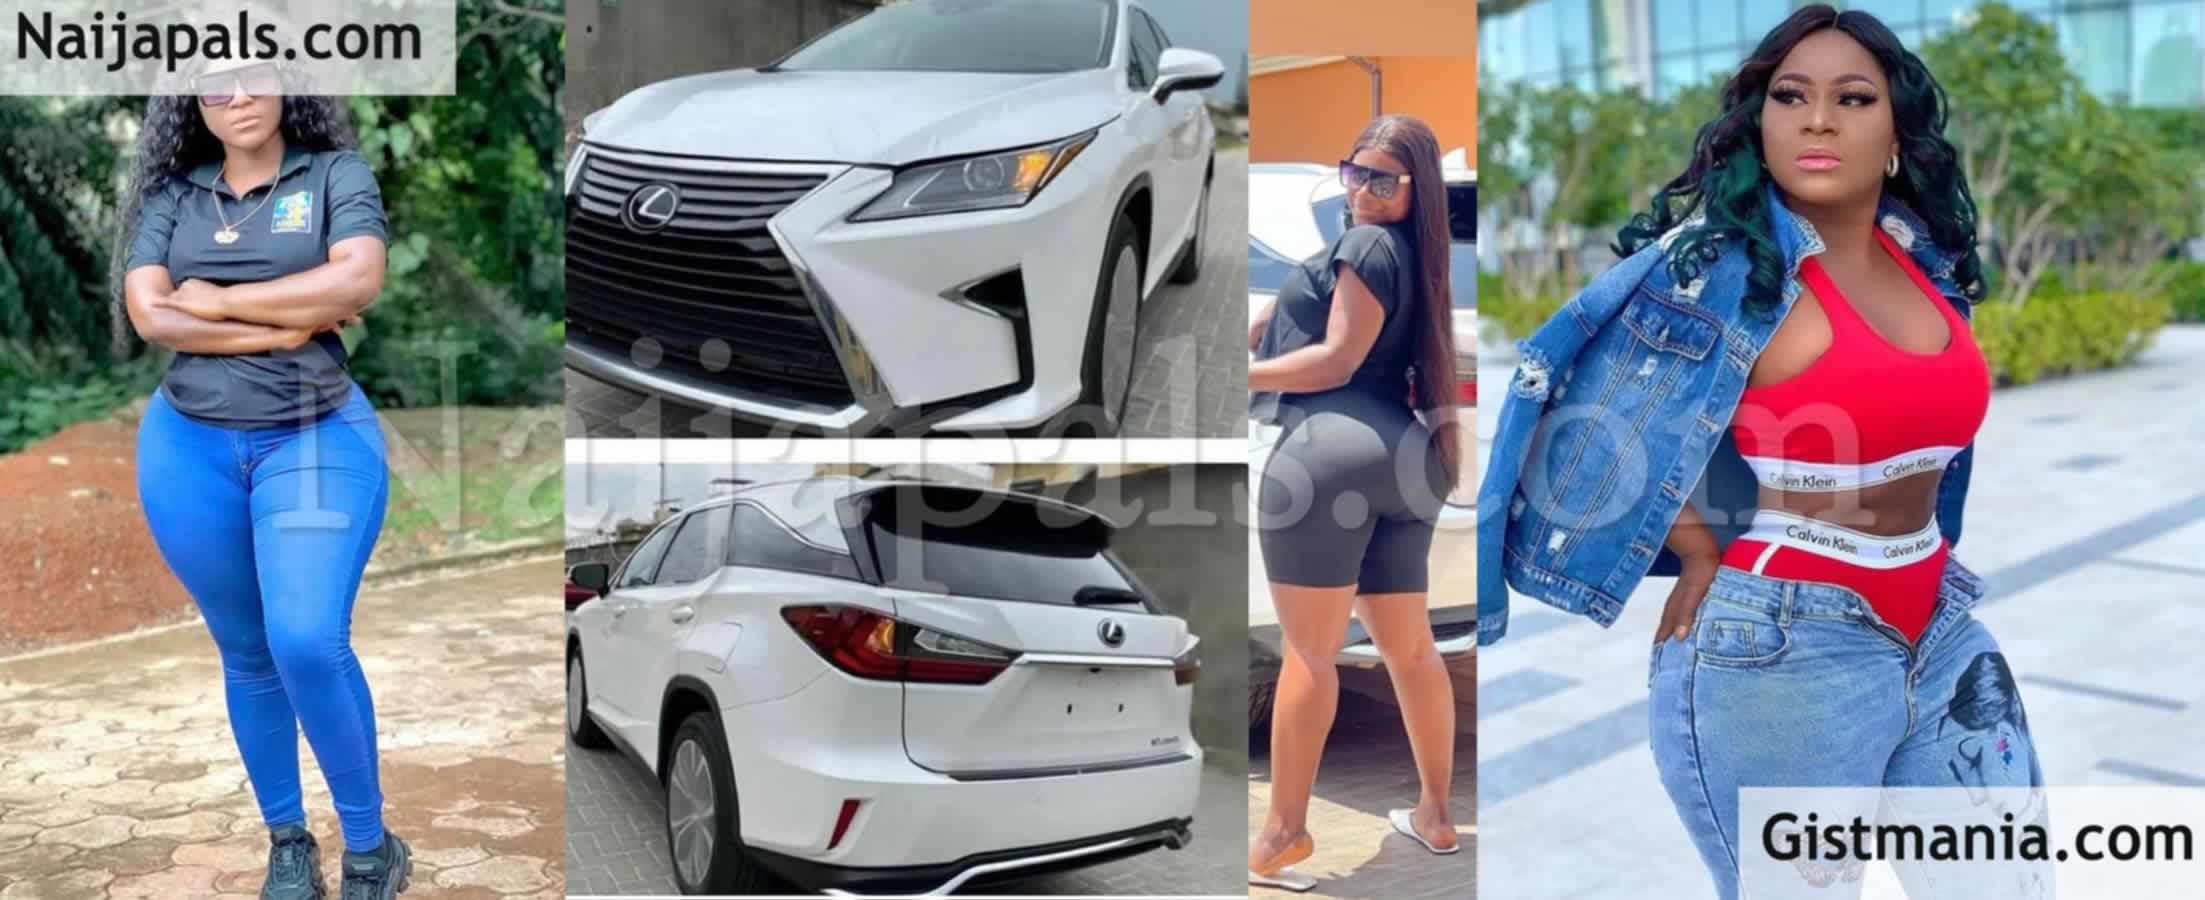 <img alt='.' class='lazyload' data-src='https://img.gistmania.com/emot/shocked.gif' /><img alt='.' class='lazyload' data-src='https://img.gistmania.com/emot/photo.png' /> <b>Actress, Destiny Etiko Acquires Brand New Lexus SUV Months After Buying A Toyota Prado</b> (Photos)